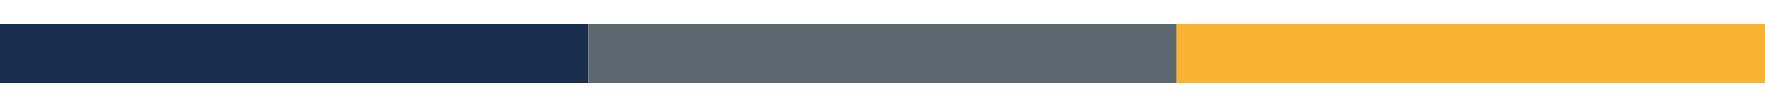 couleurs logo orgeco abg audit convergence